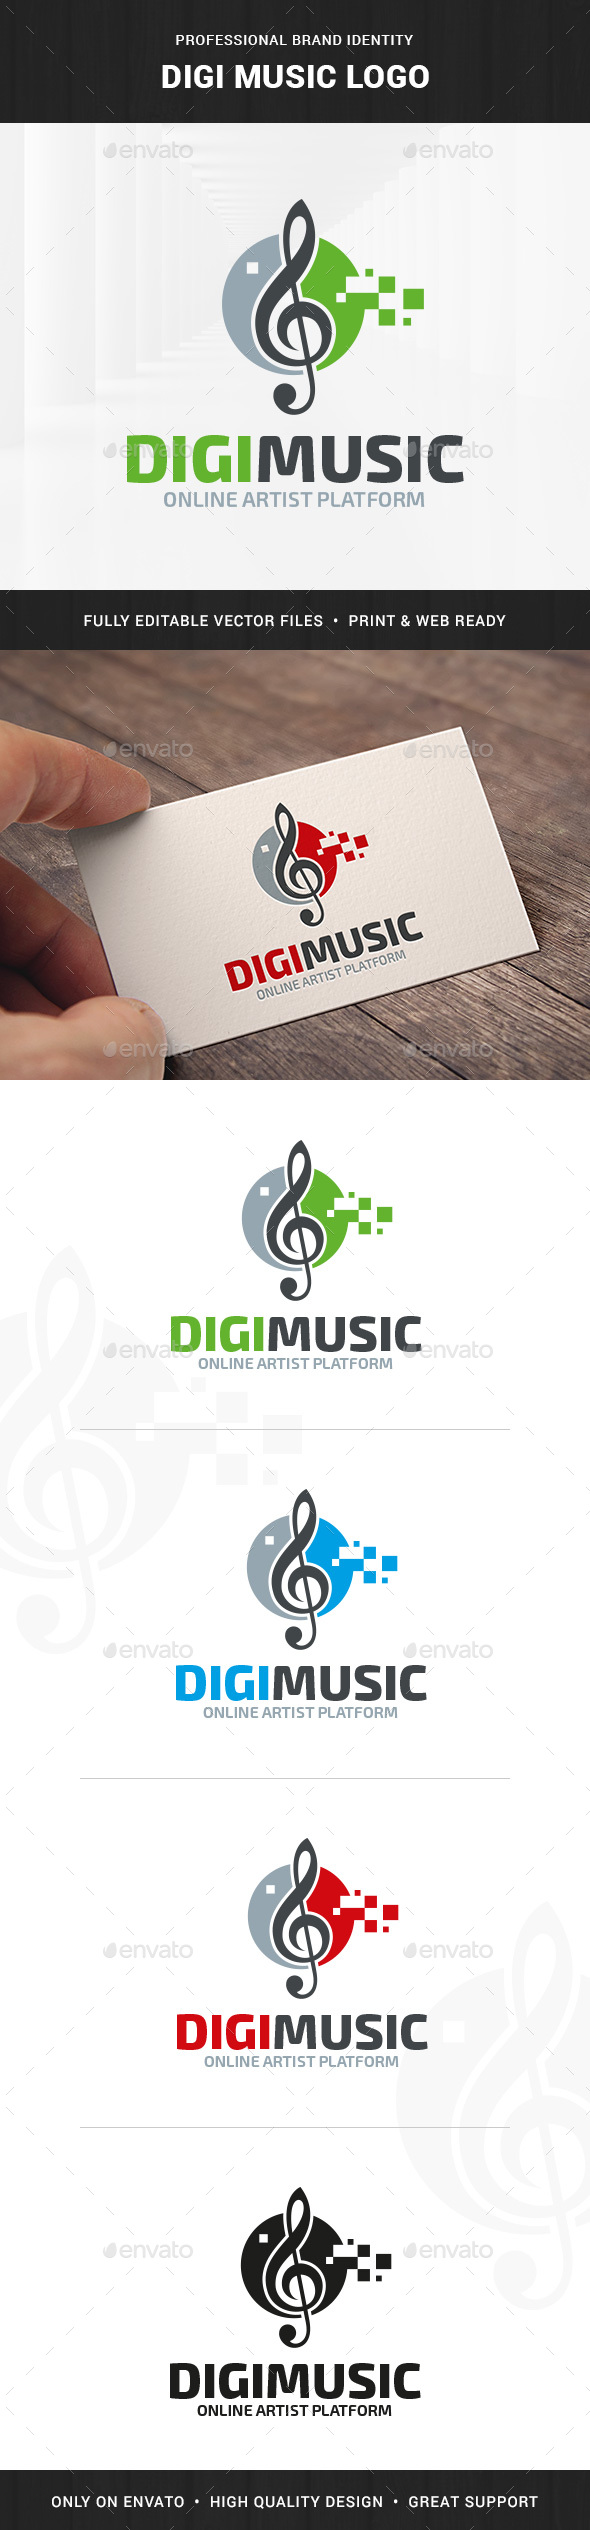 Digi Music Logo Template